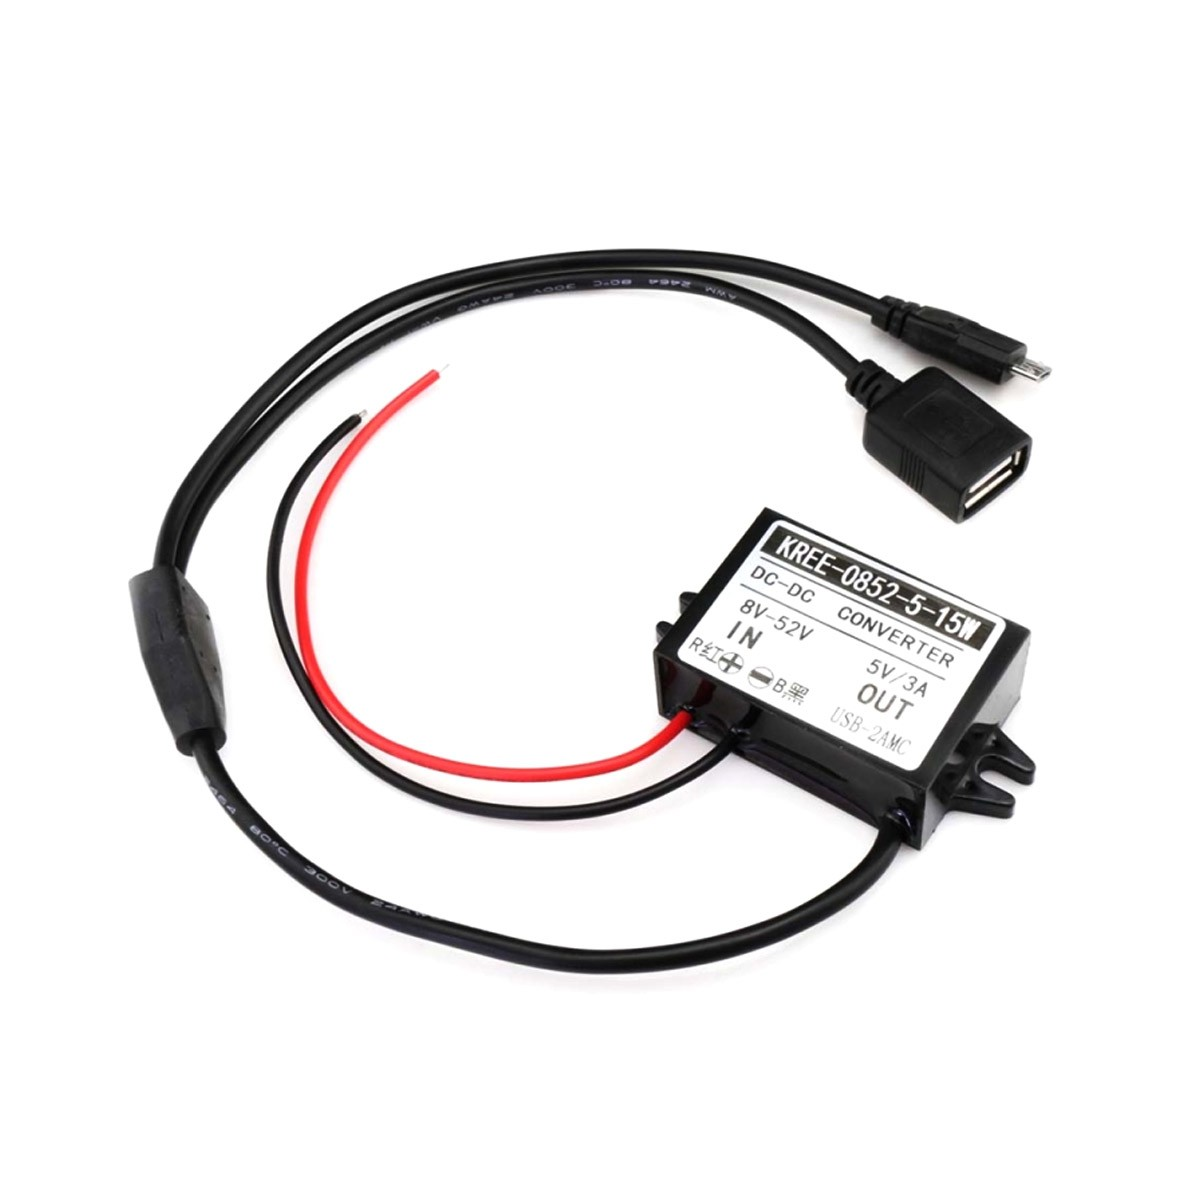 TINYSINE DC-DC Converter 8-25V to 5V Micro USB / USB-A